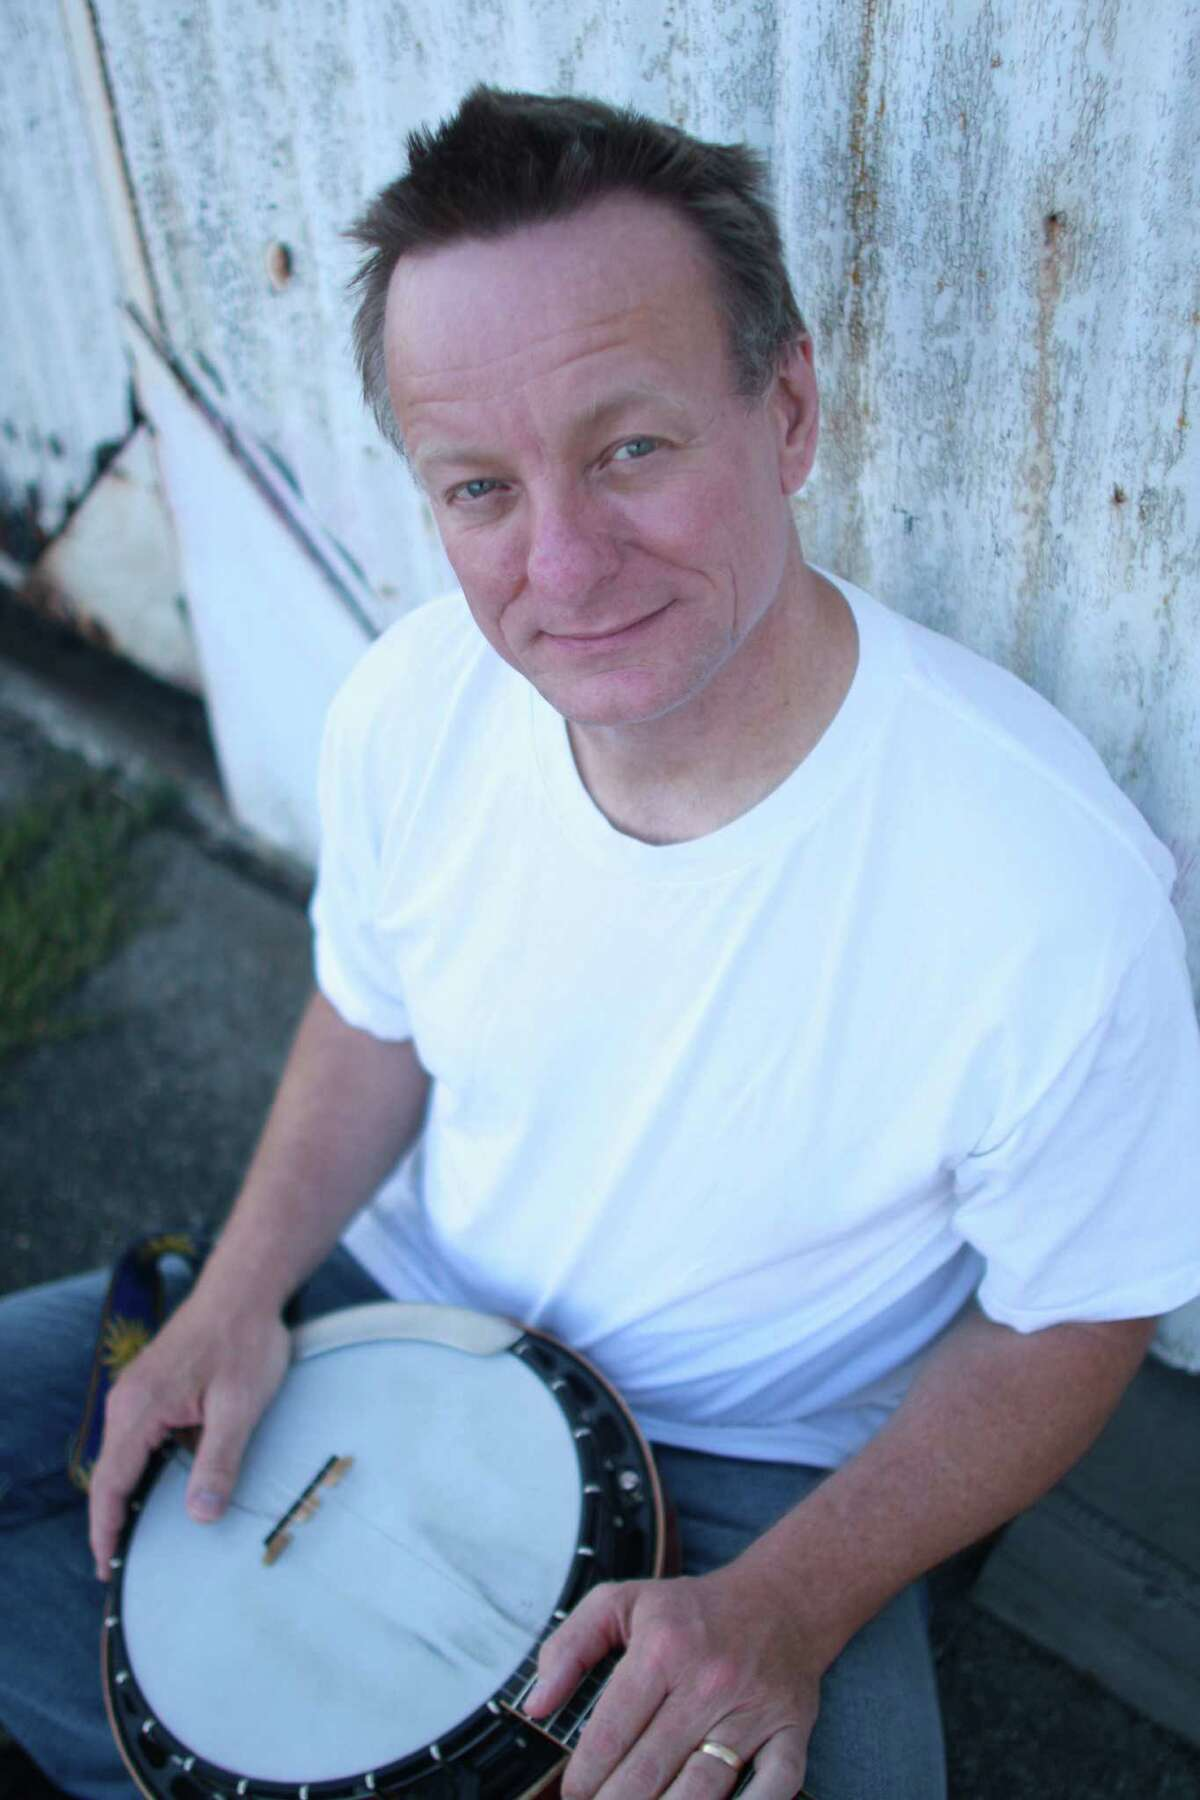 image of musician Danny Barnes